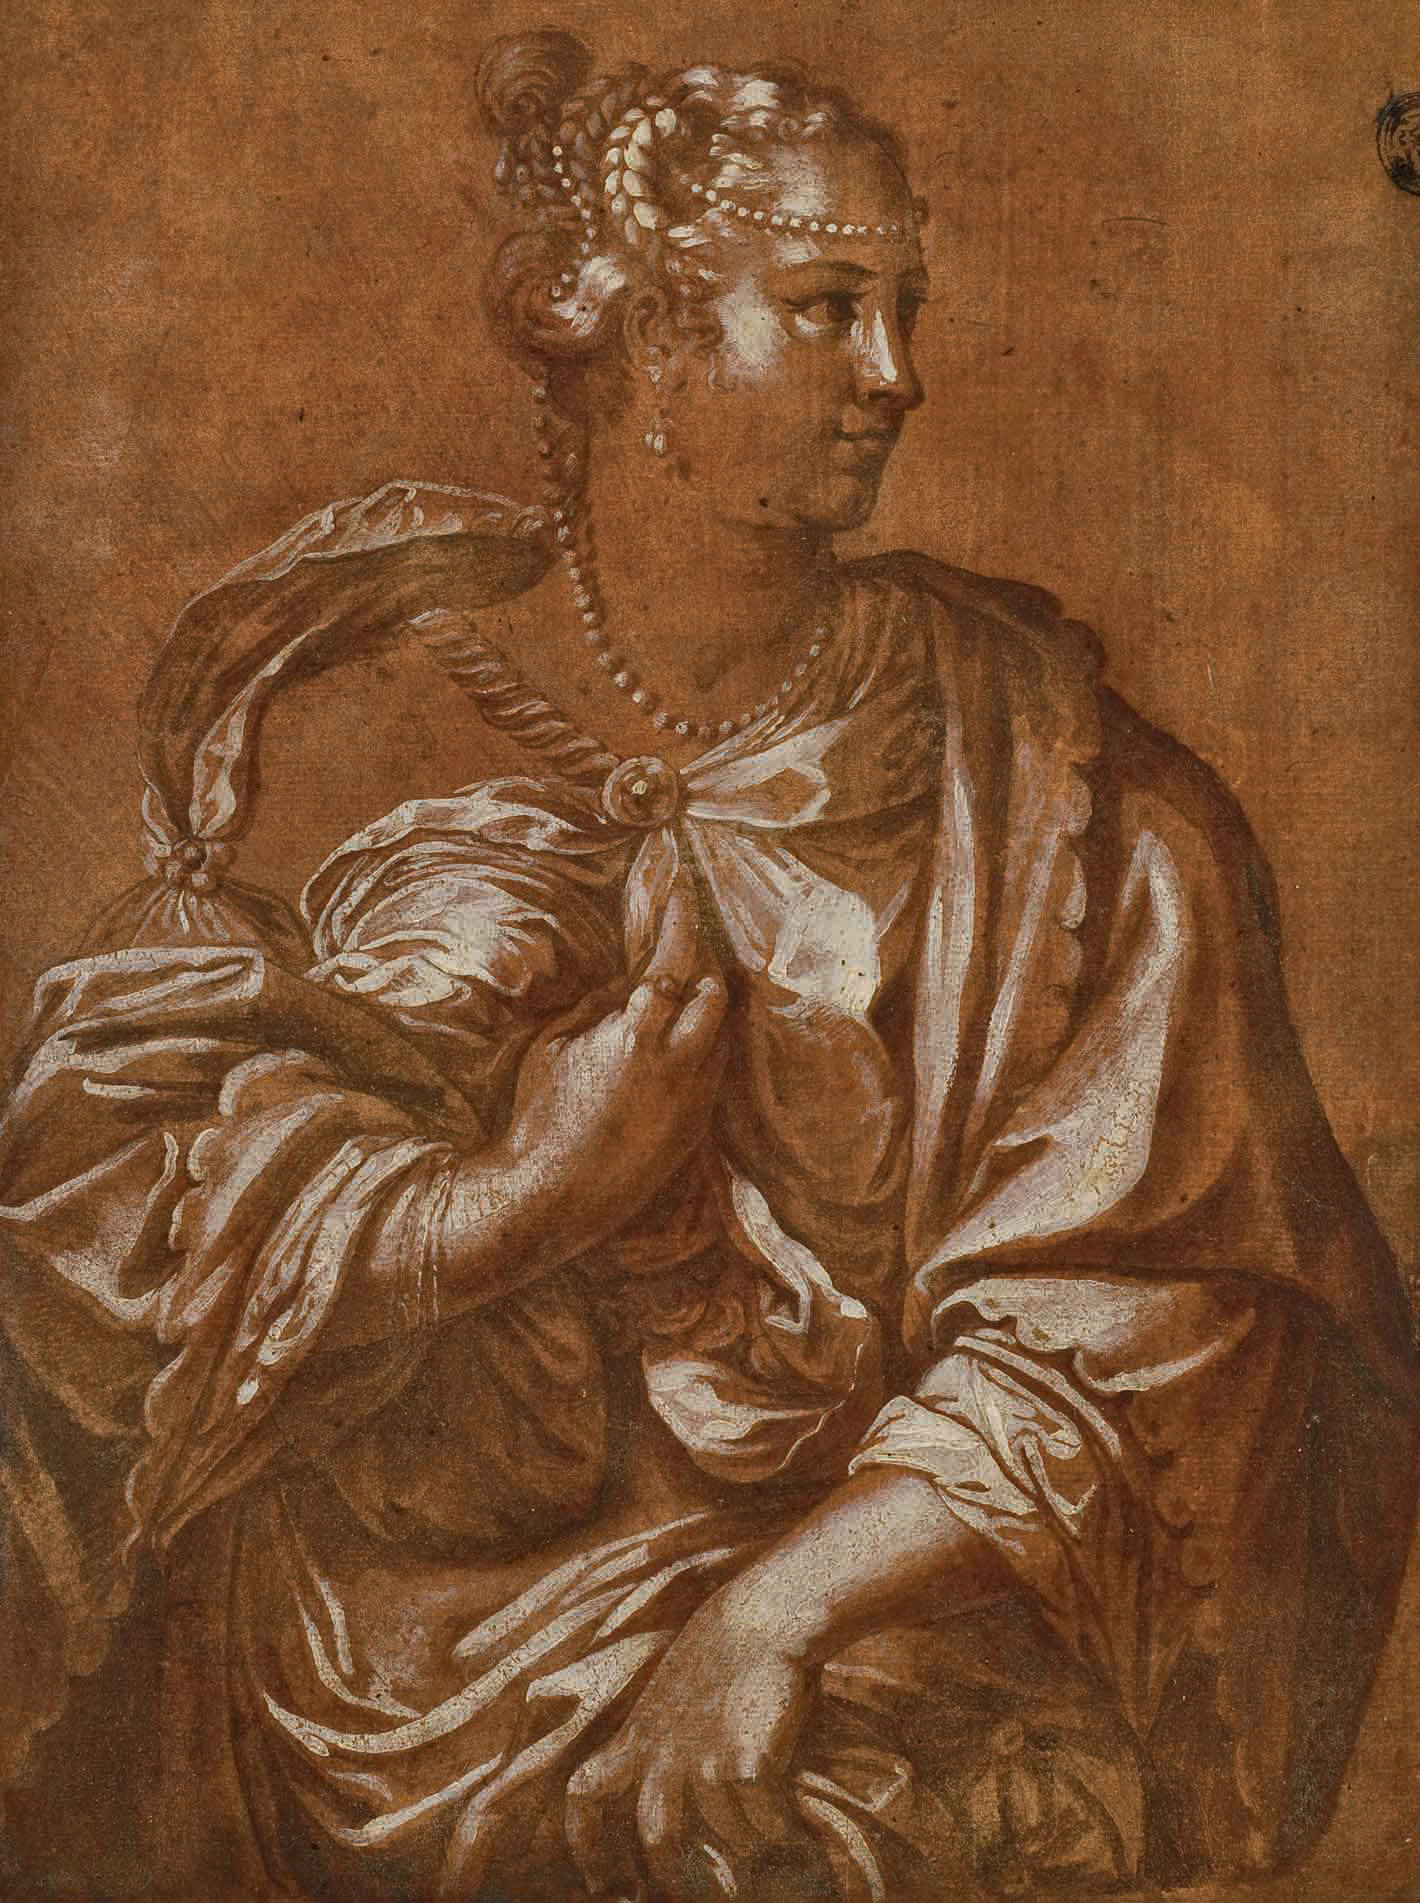 ENTOURAGE DE PAOLO CALIARI, DIT VERONESE (1528-1588)